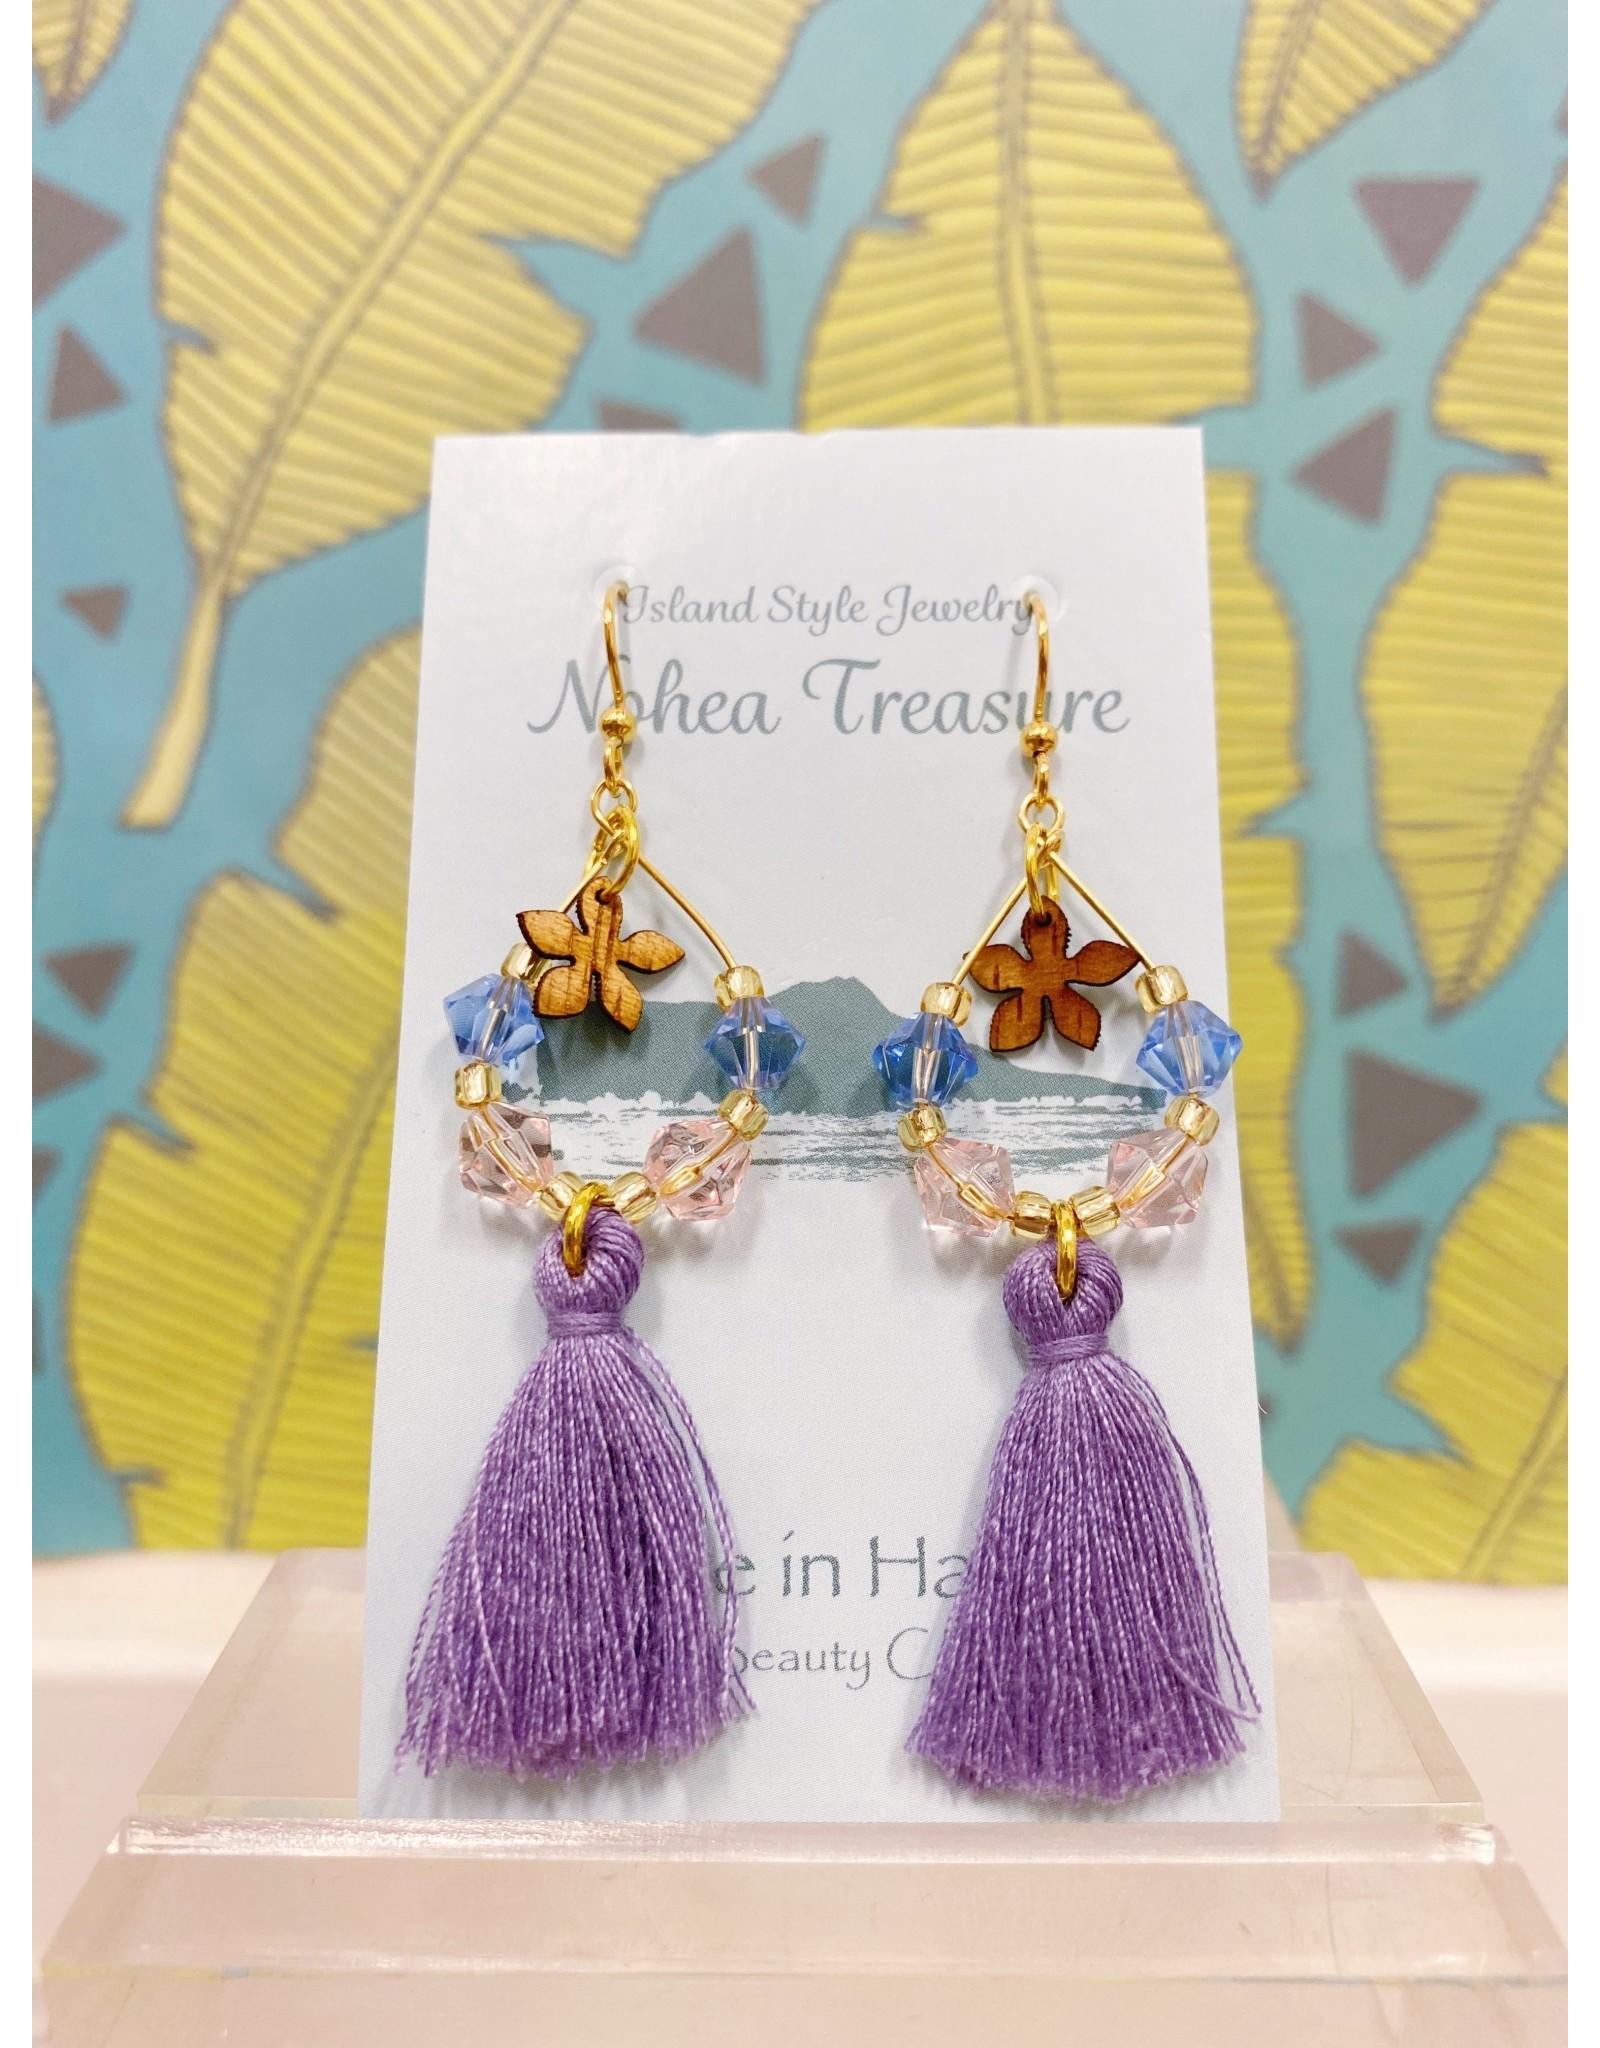 Aloha Beauty Creations Nohea Treasure Accessories Earrings Plumeria/Tassels